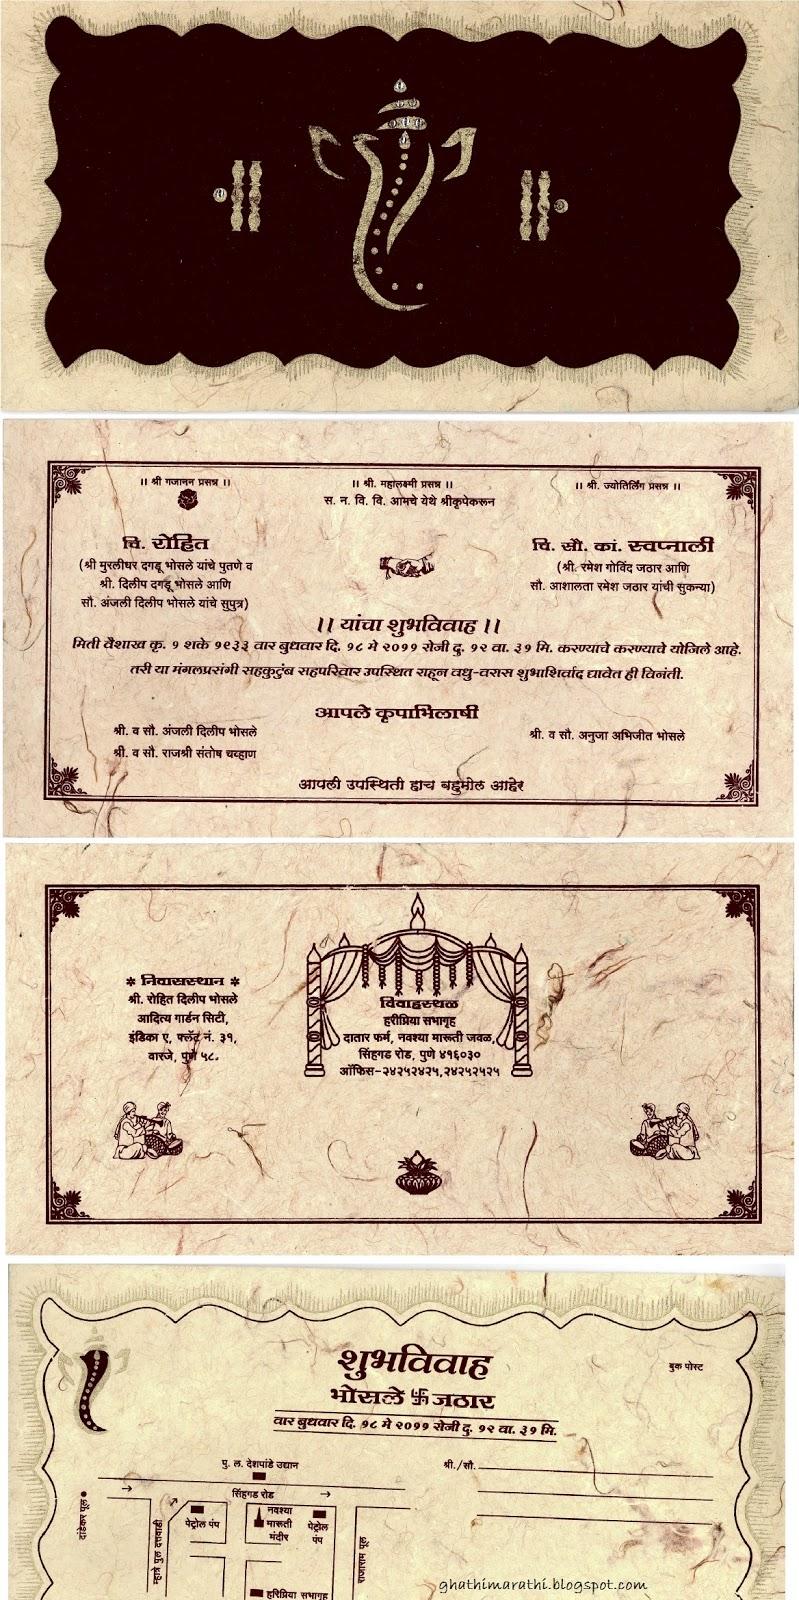 Marathi Wedding Card Format In English Marathi Inspiring